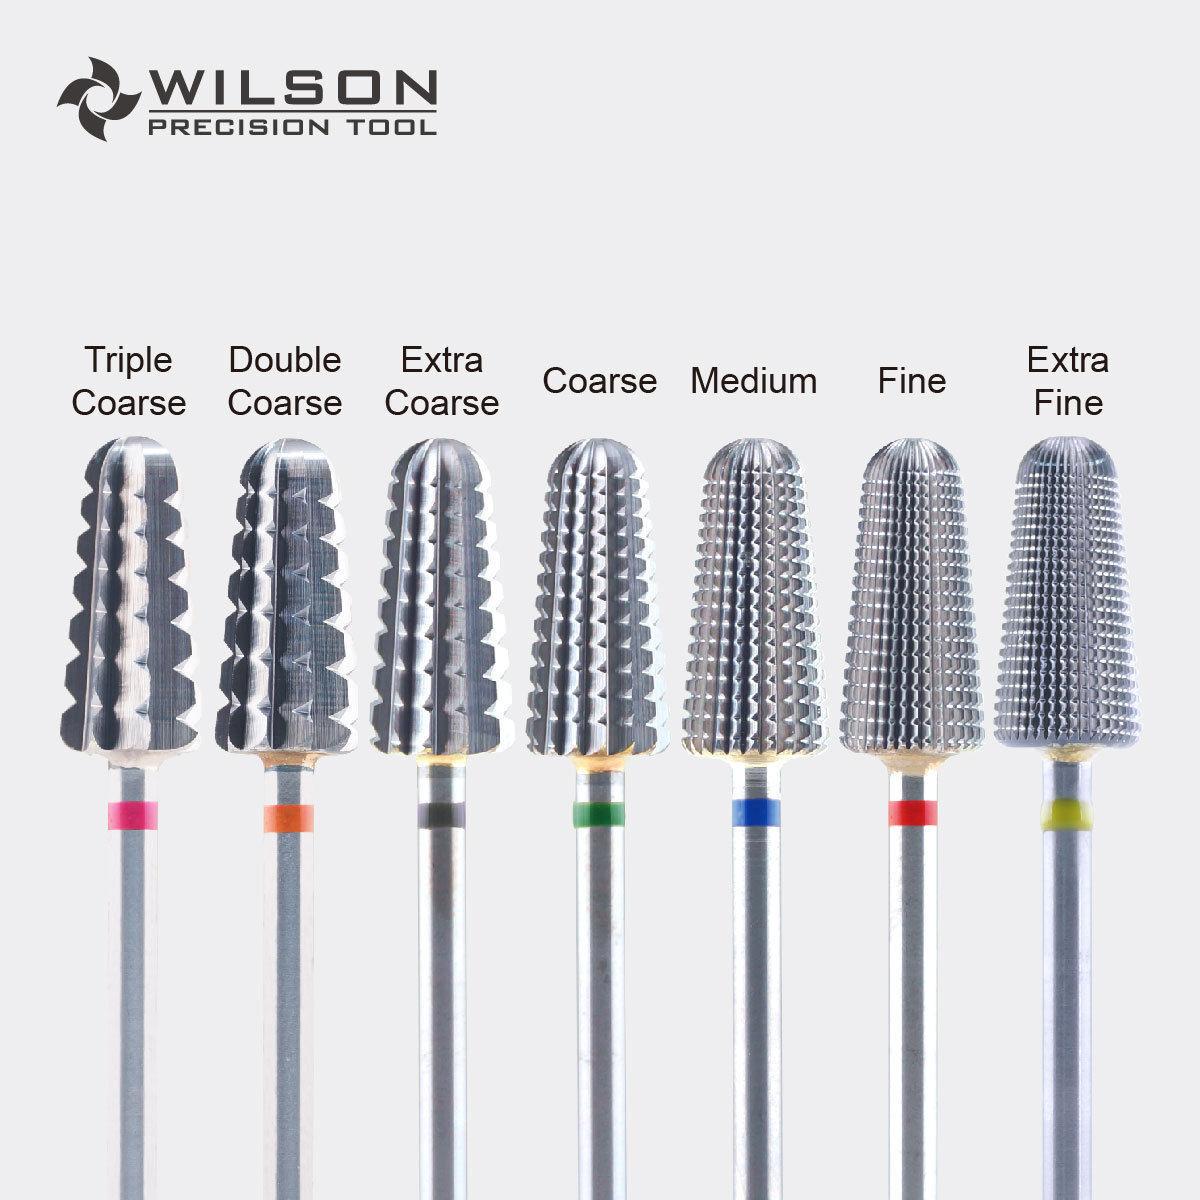 Volcano Bits - WILSON Carbide Nail Drill Bit US SELLER